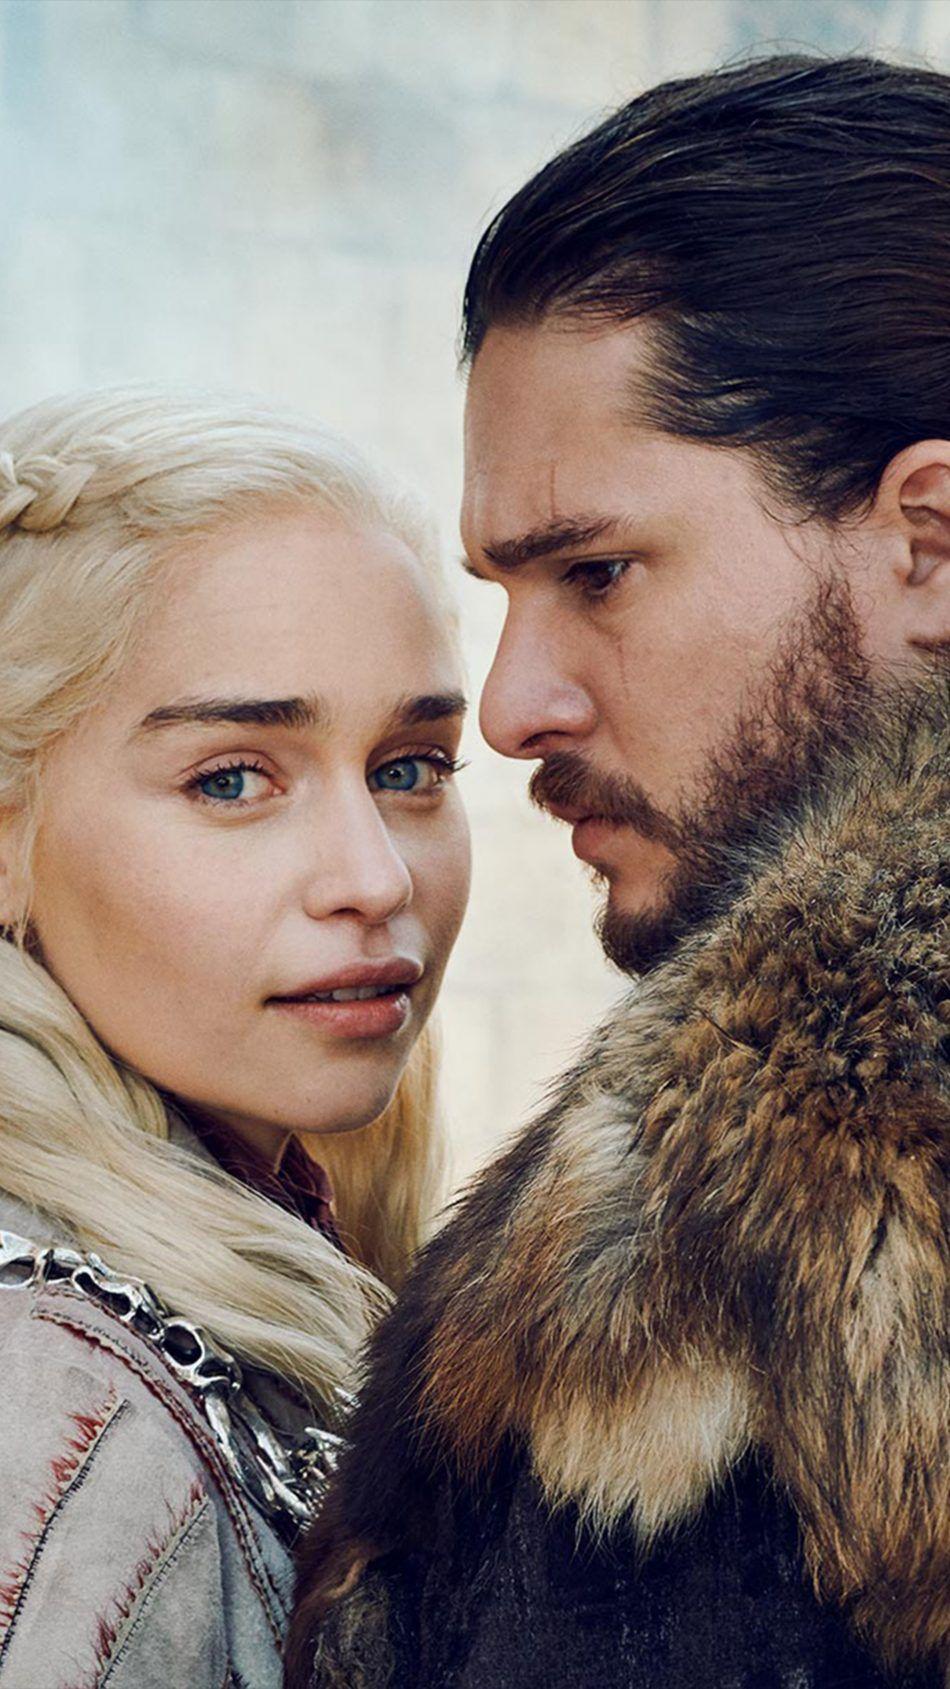 Daenerys Targaryen In Game Of Thrones iPhone 5s